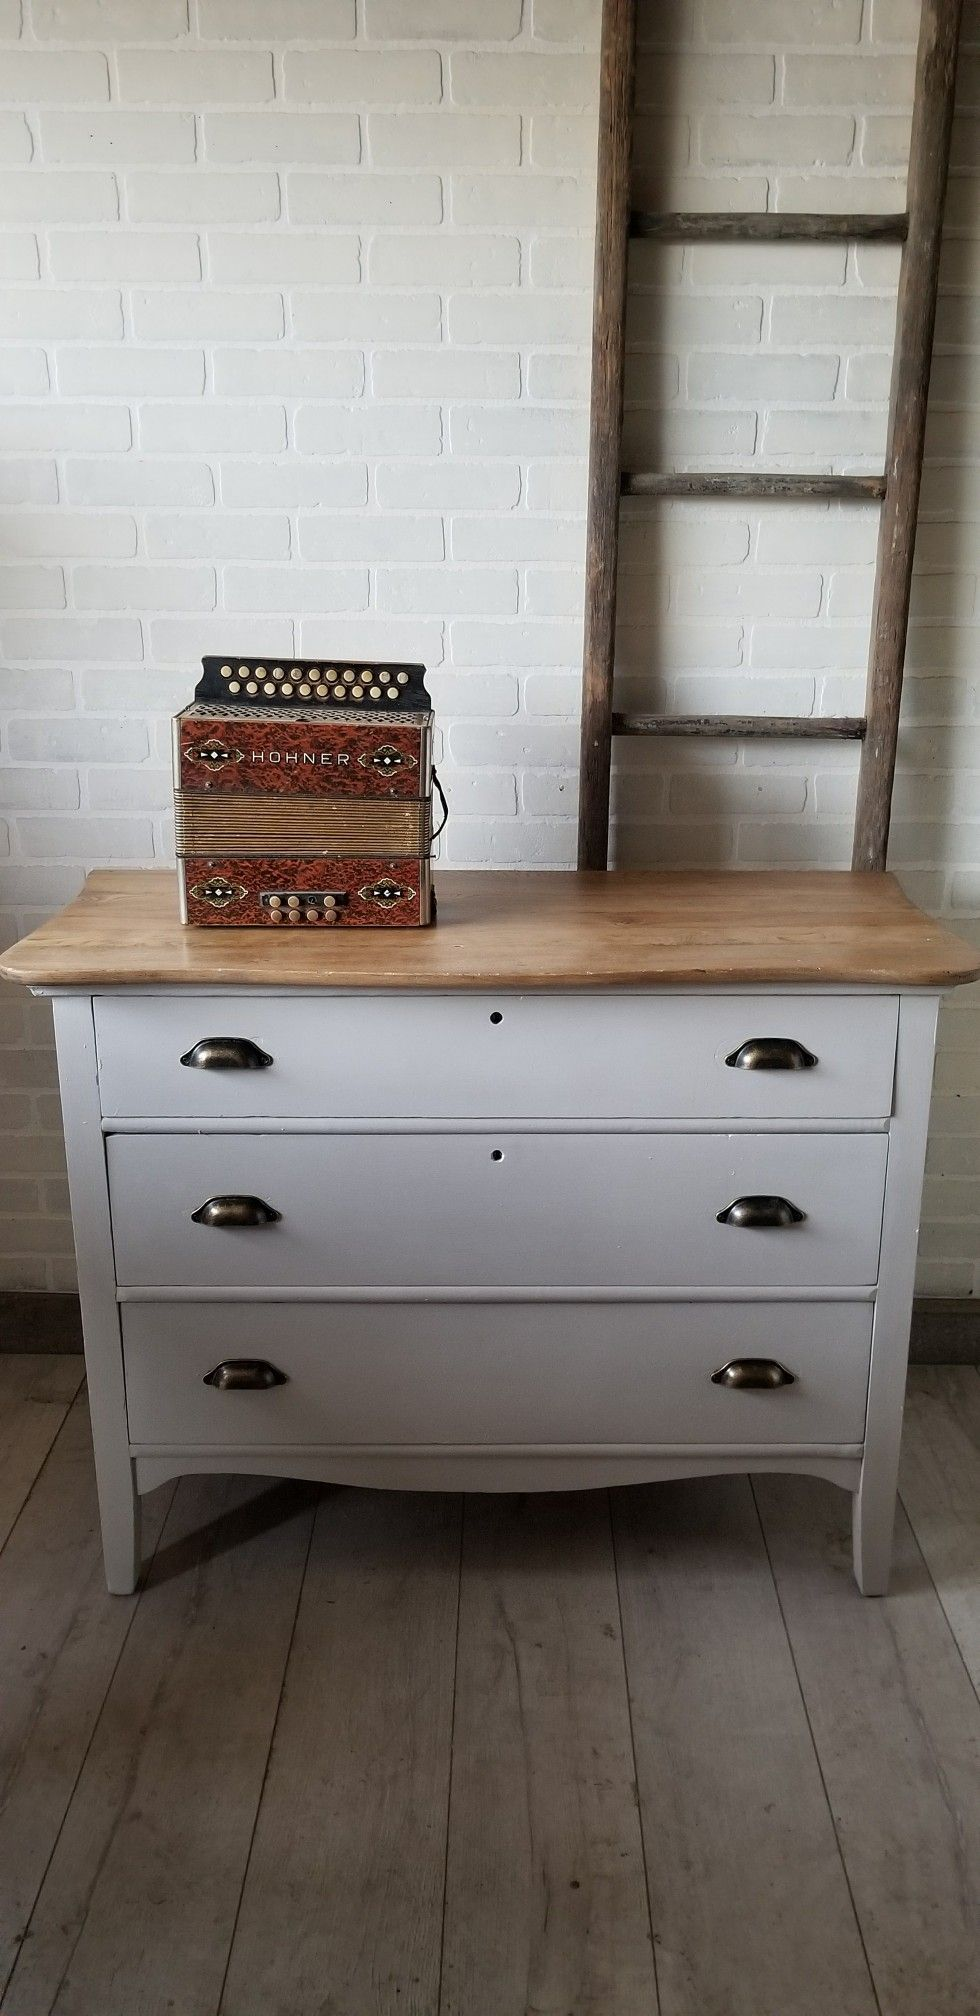 Wood Top Dresser Very Light Gray Bottom Furniture Projects Furniture Refinishing Furniture [ 2016 x 980 Pixel ]